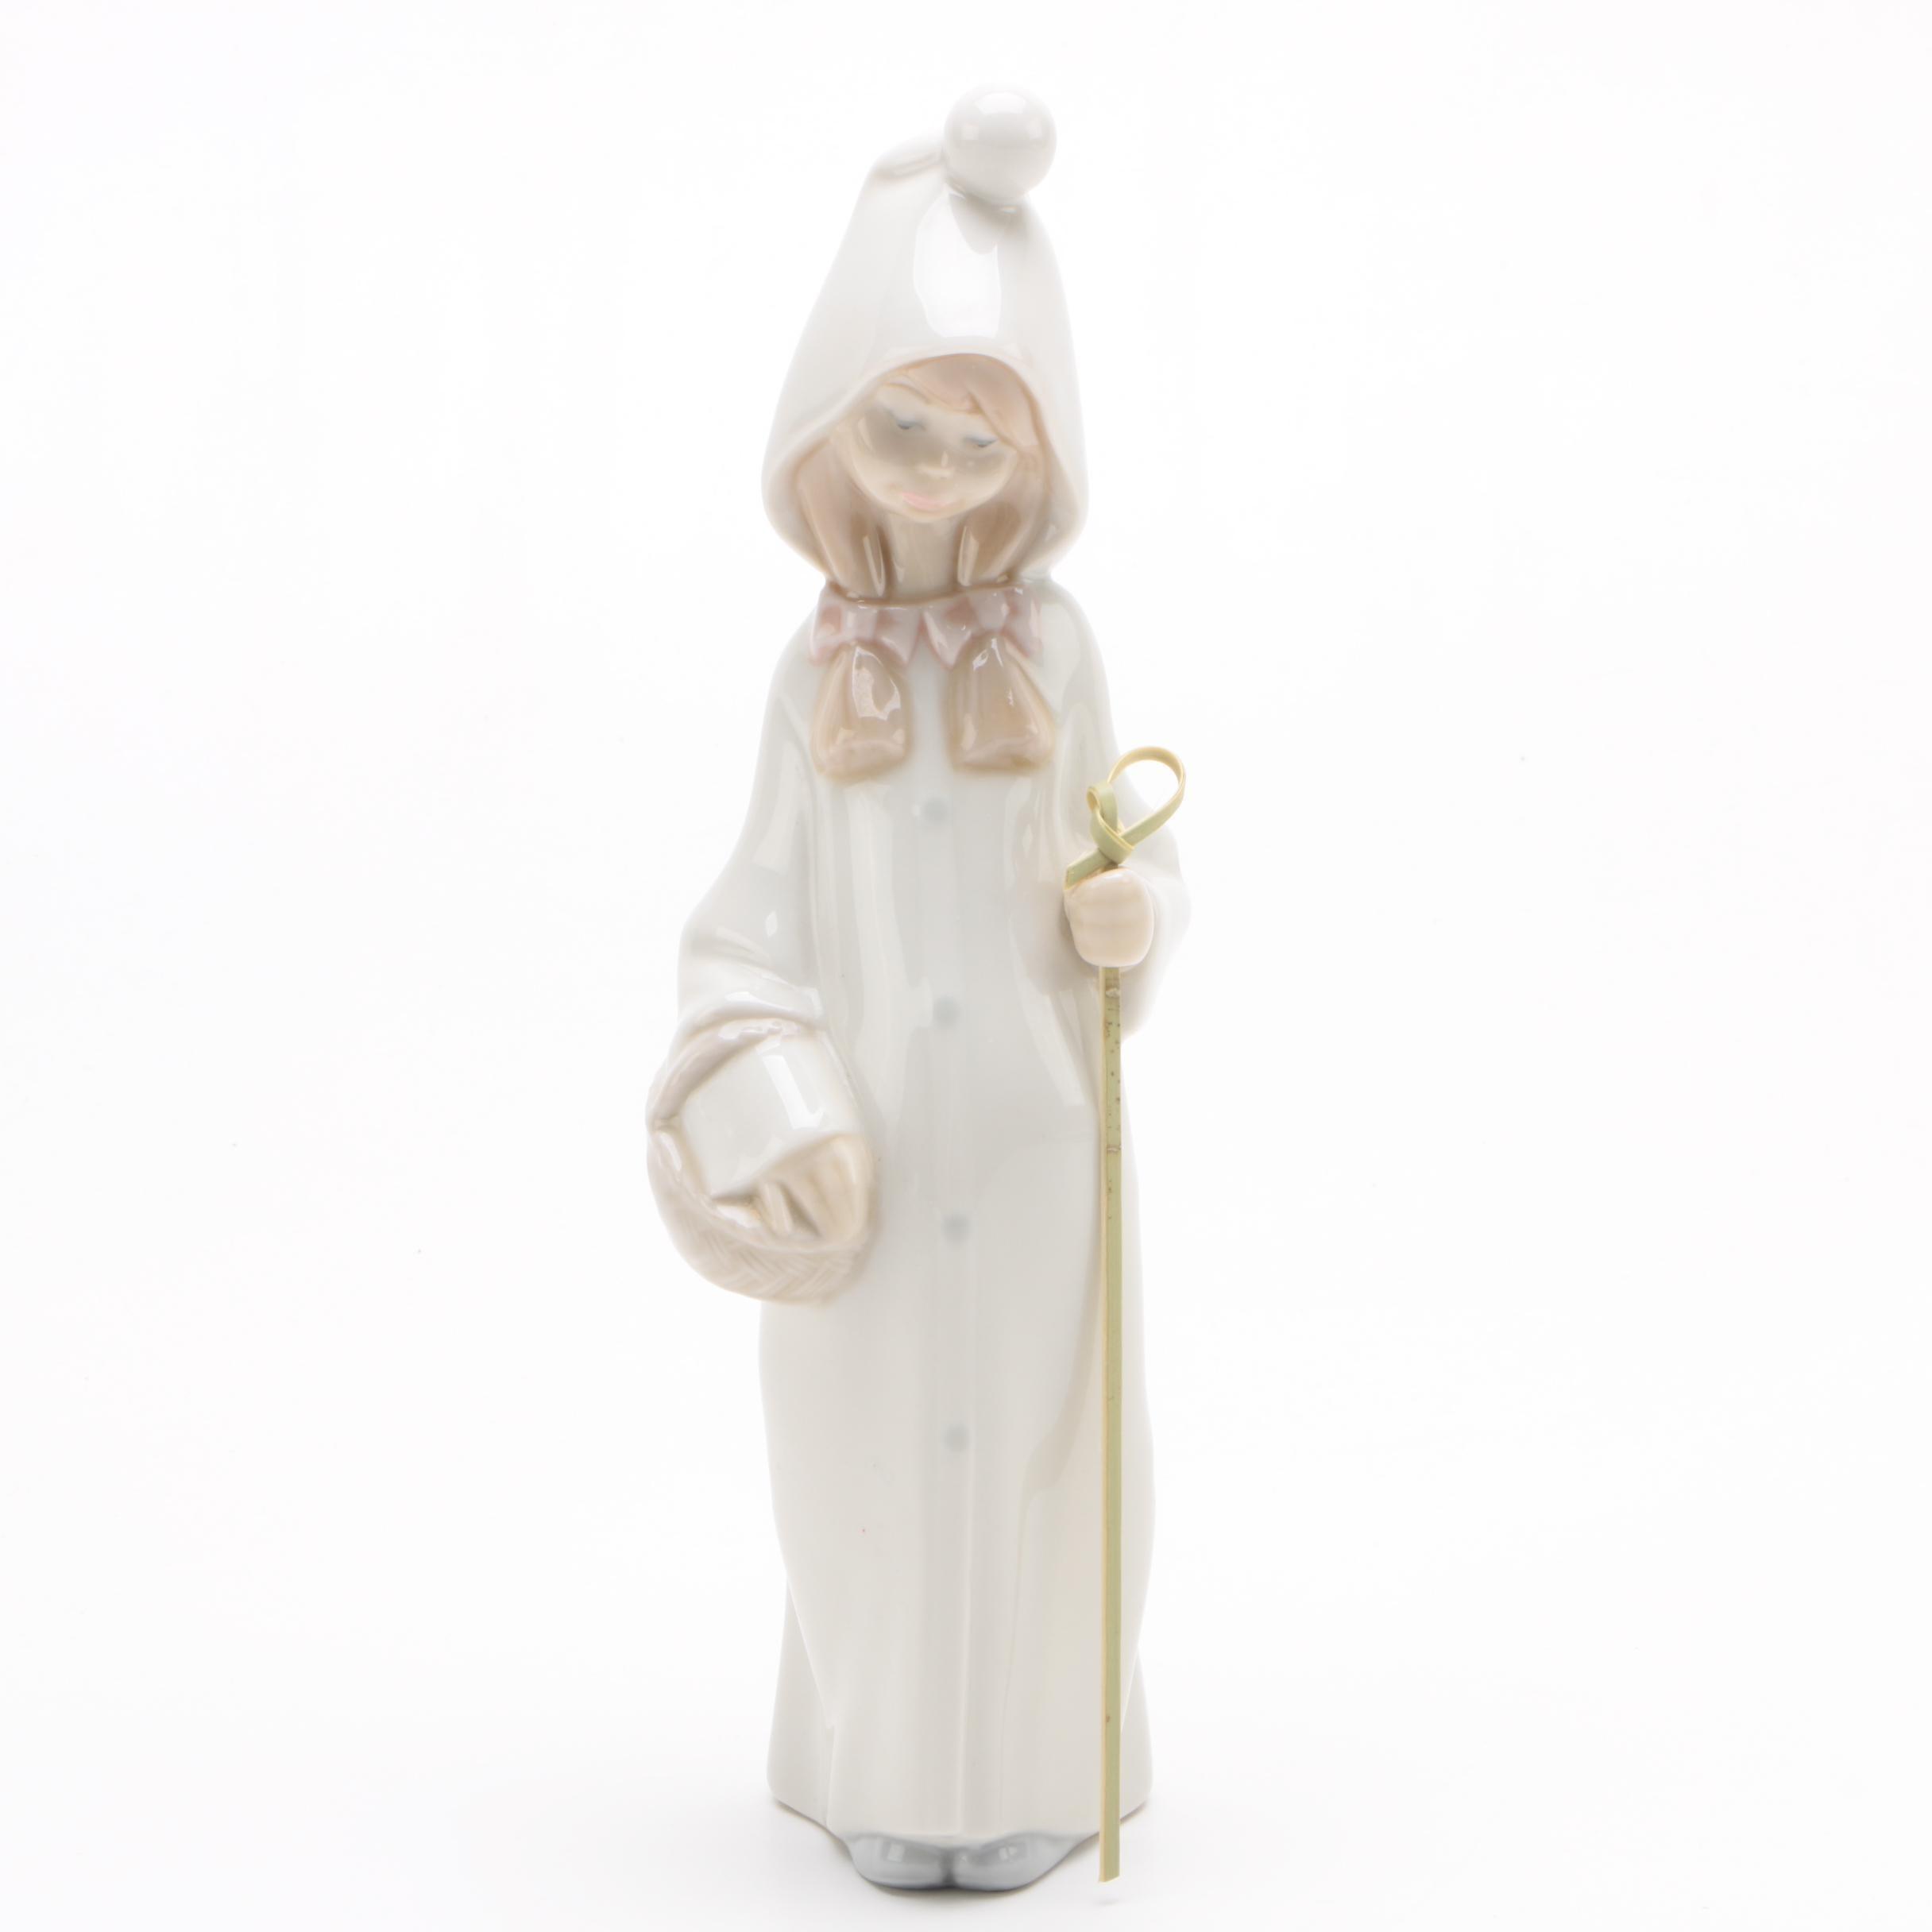 "Lladró ""Shepherd Girl"" Porcelain Figurine"